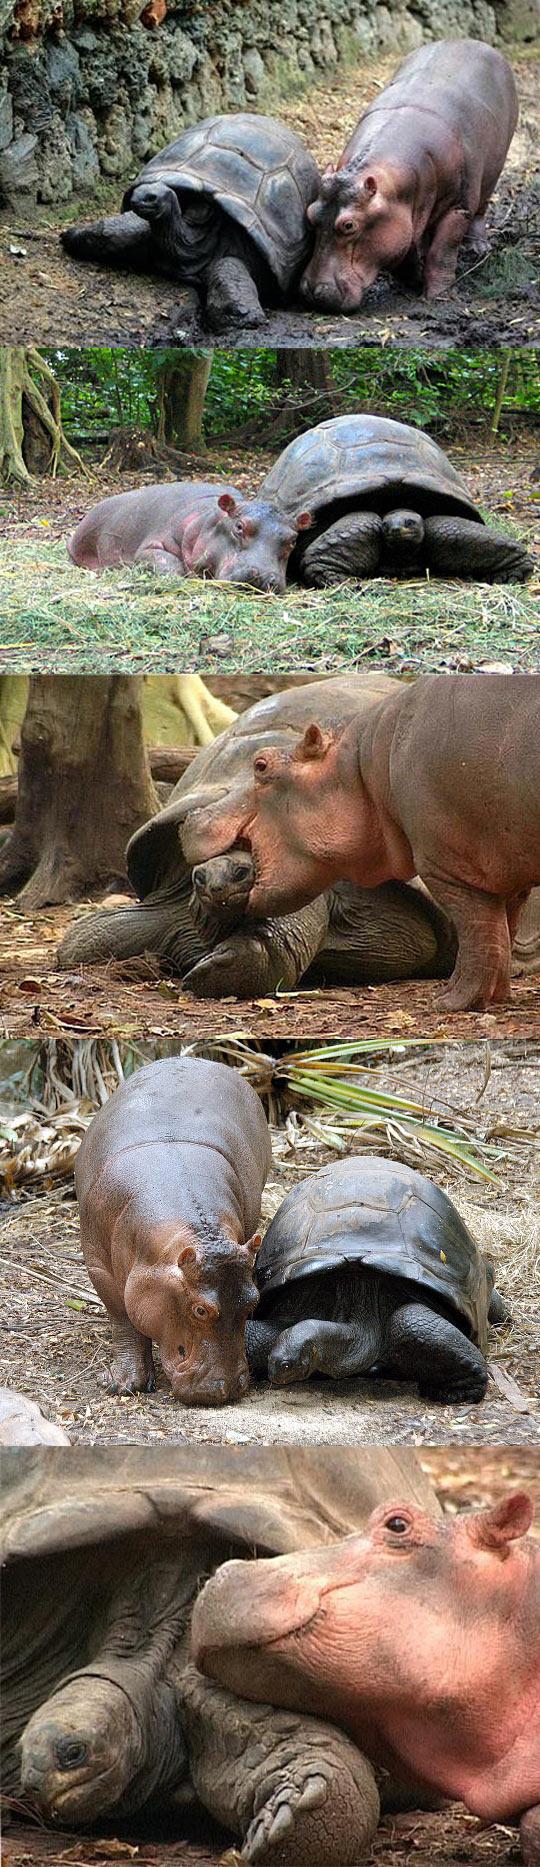 funny-baby-hippo-tortoise-friends-love